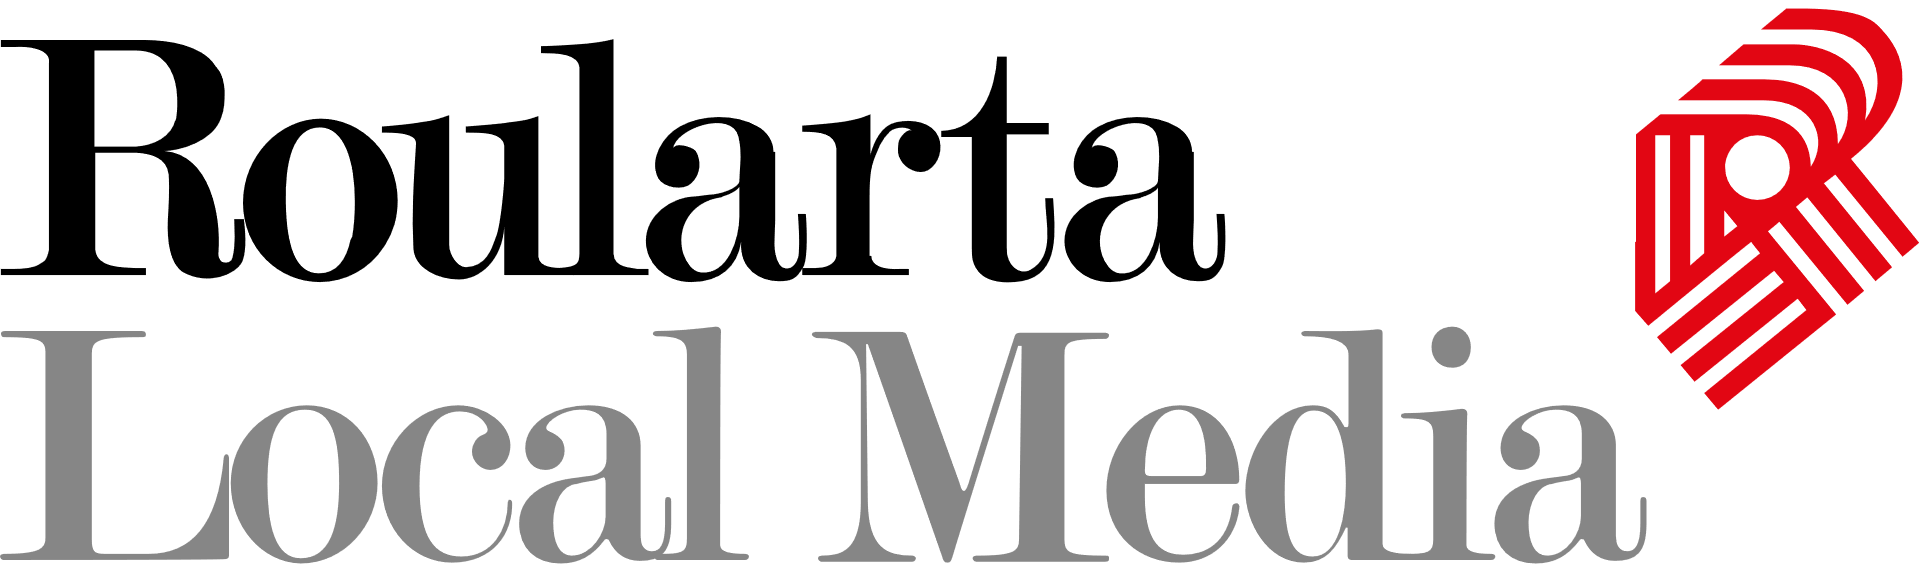 roularta local media